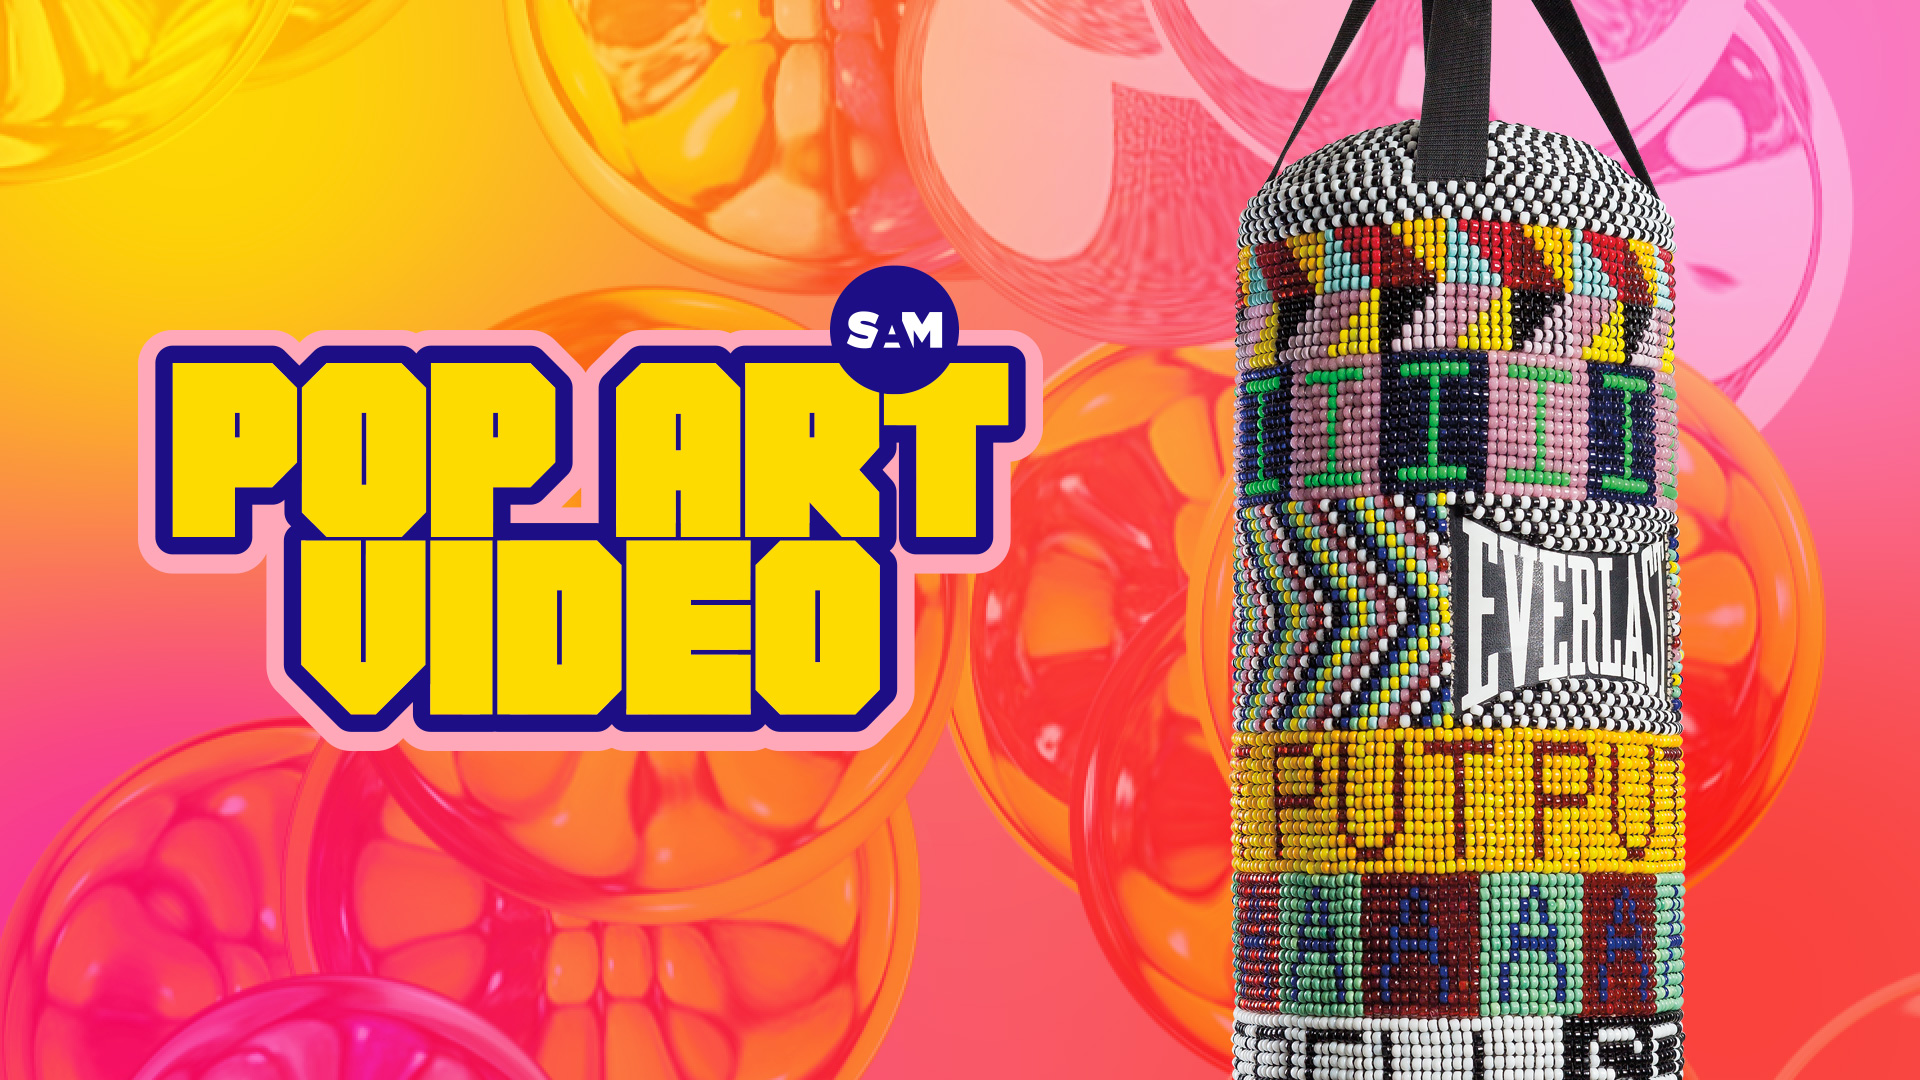 Pop-Art Video: I Put a Spell on You, Jeffrey Gibson